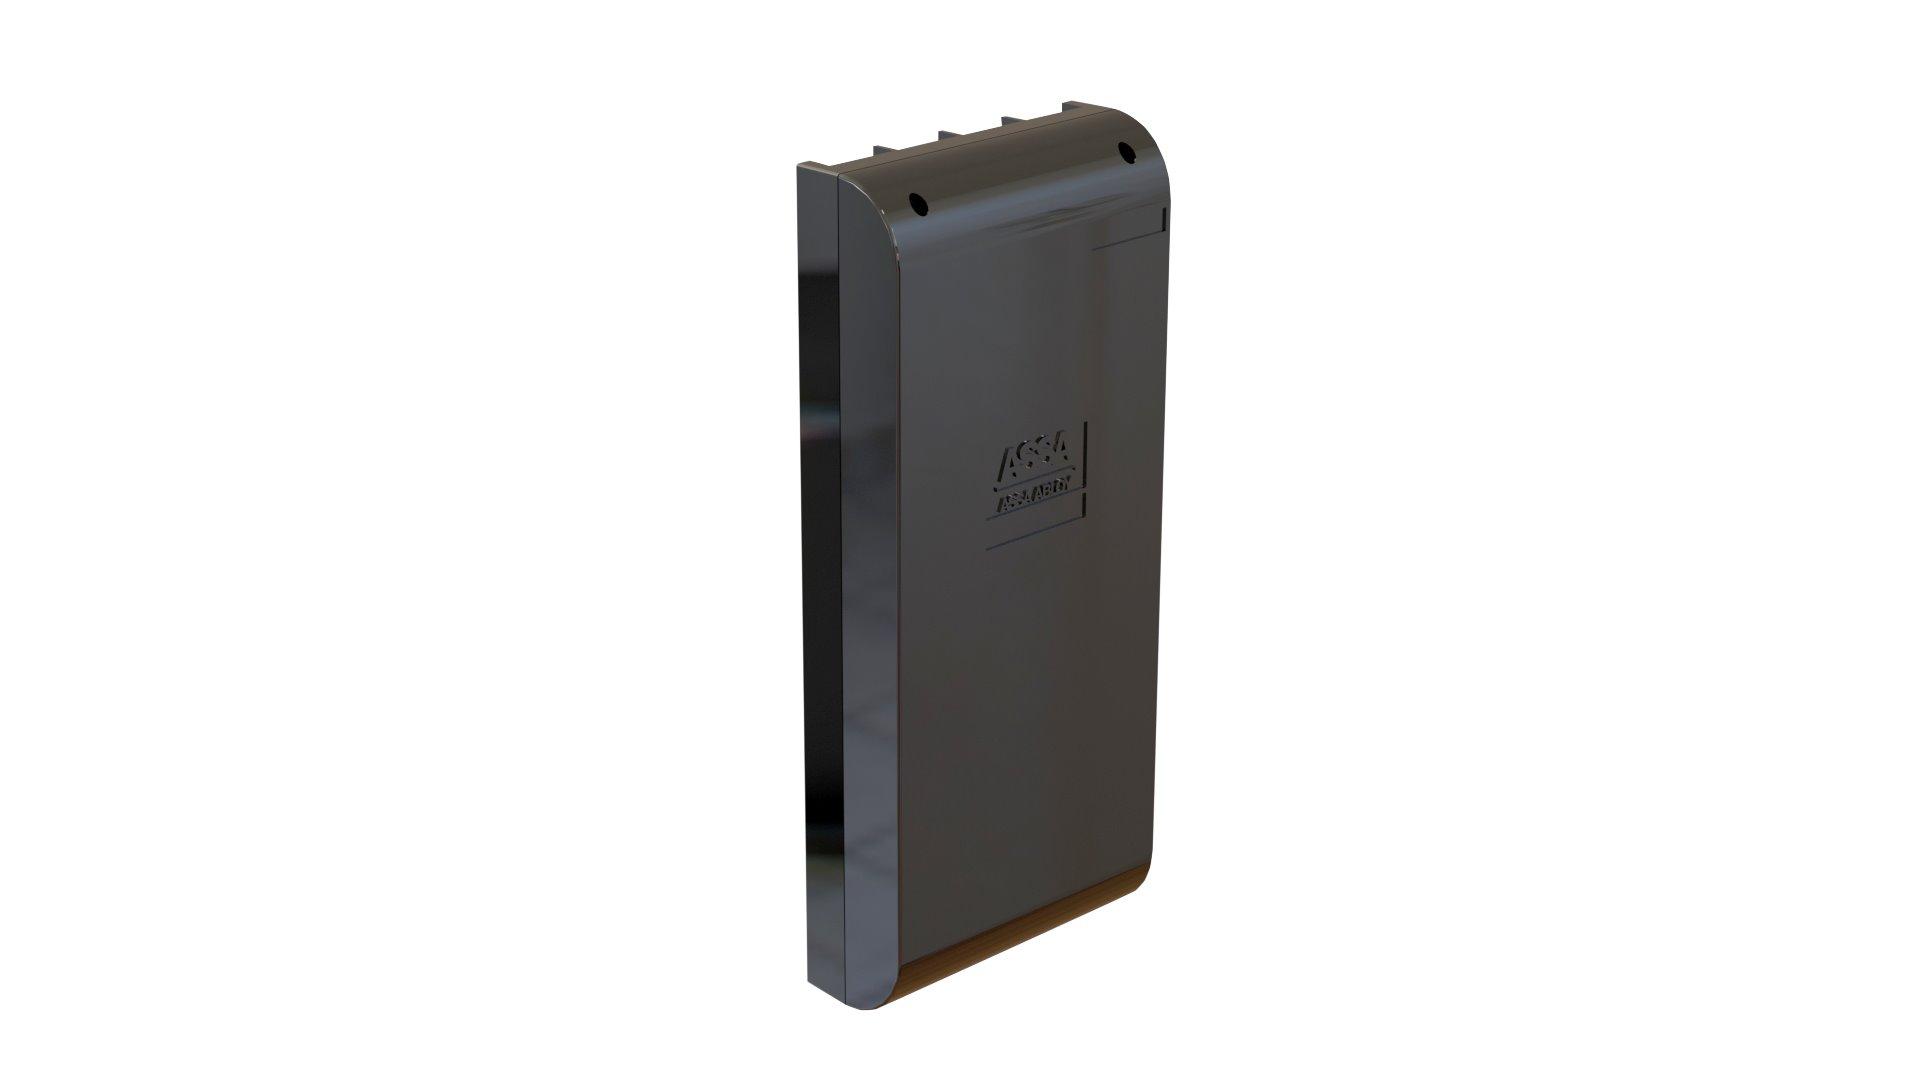 RX9016